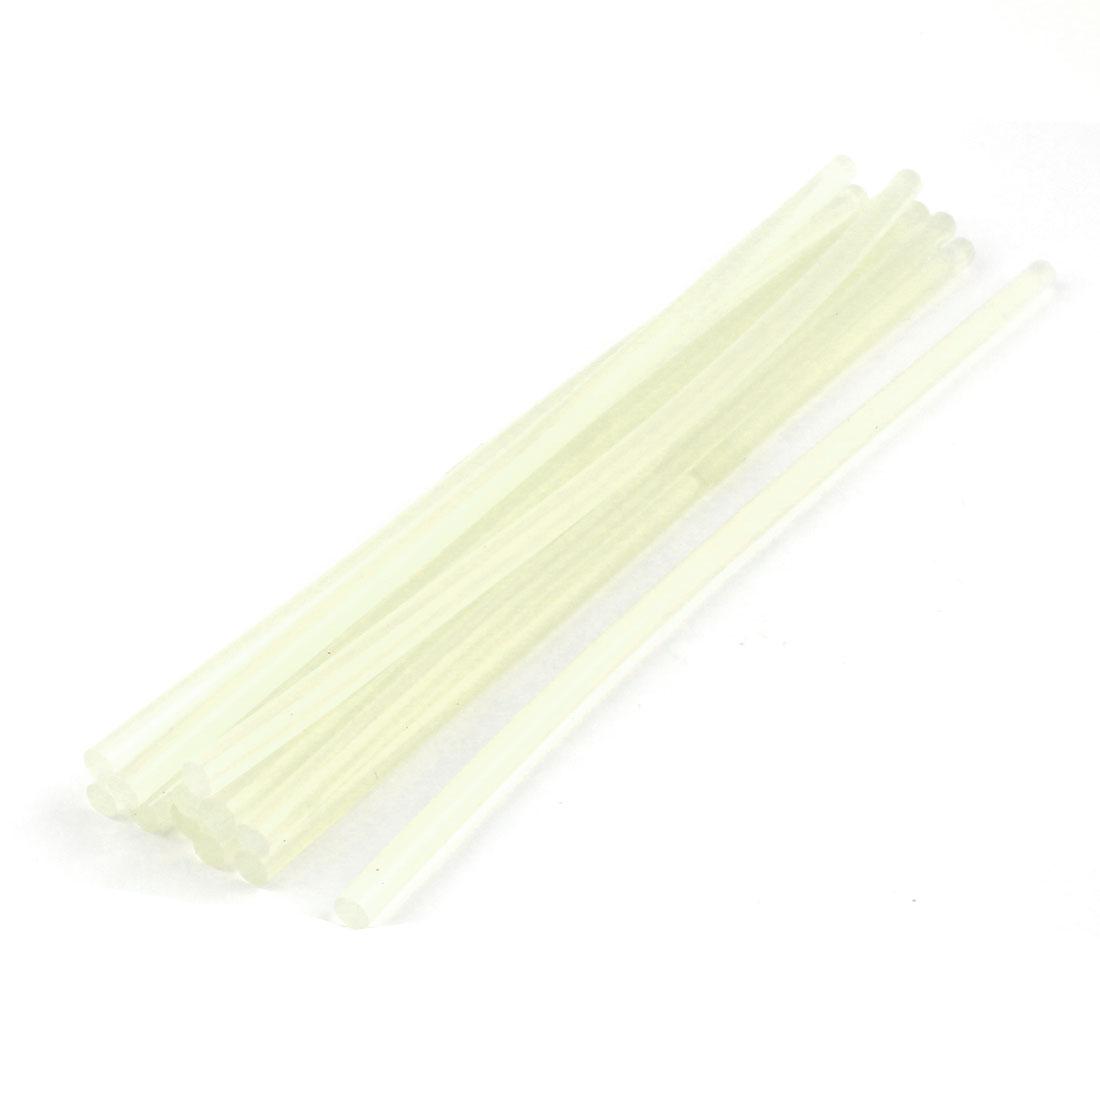 20 Pcs 7mm Dia Clear White EVA Hot Melt Glue Sticks for Fabric Attachment